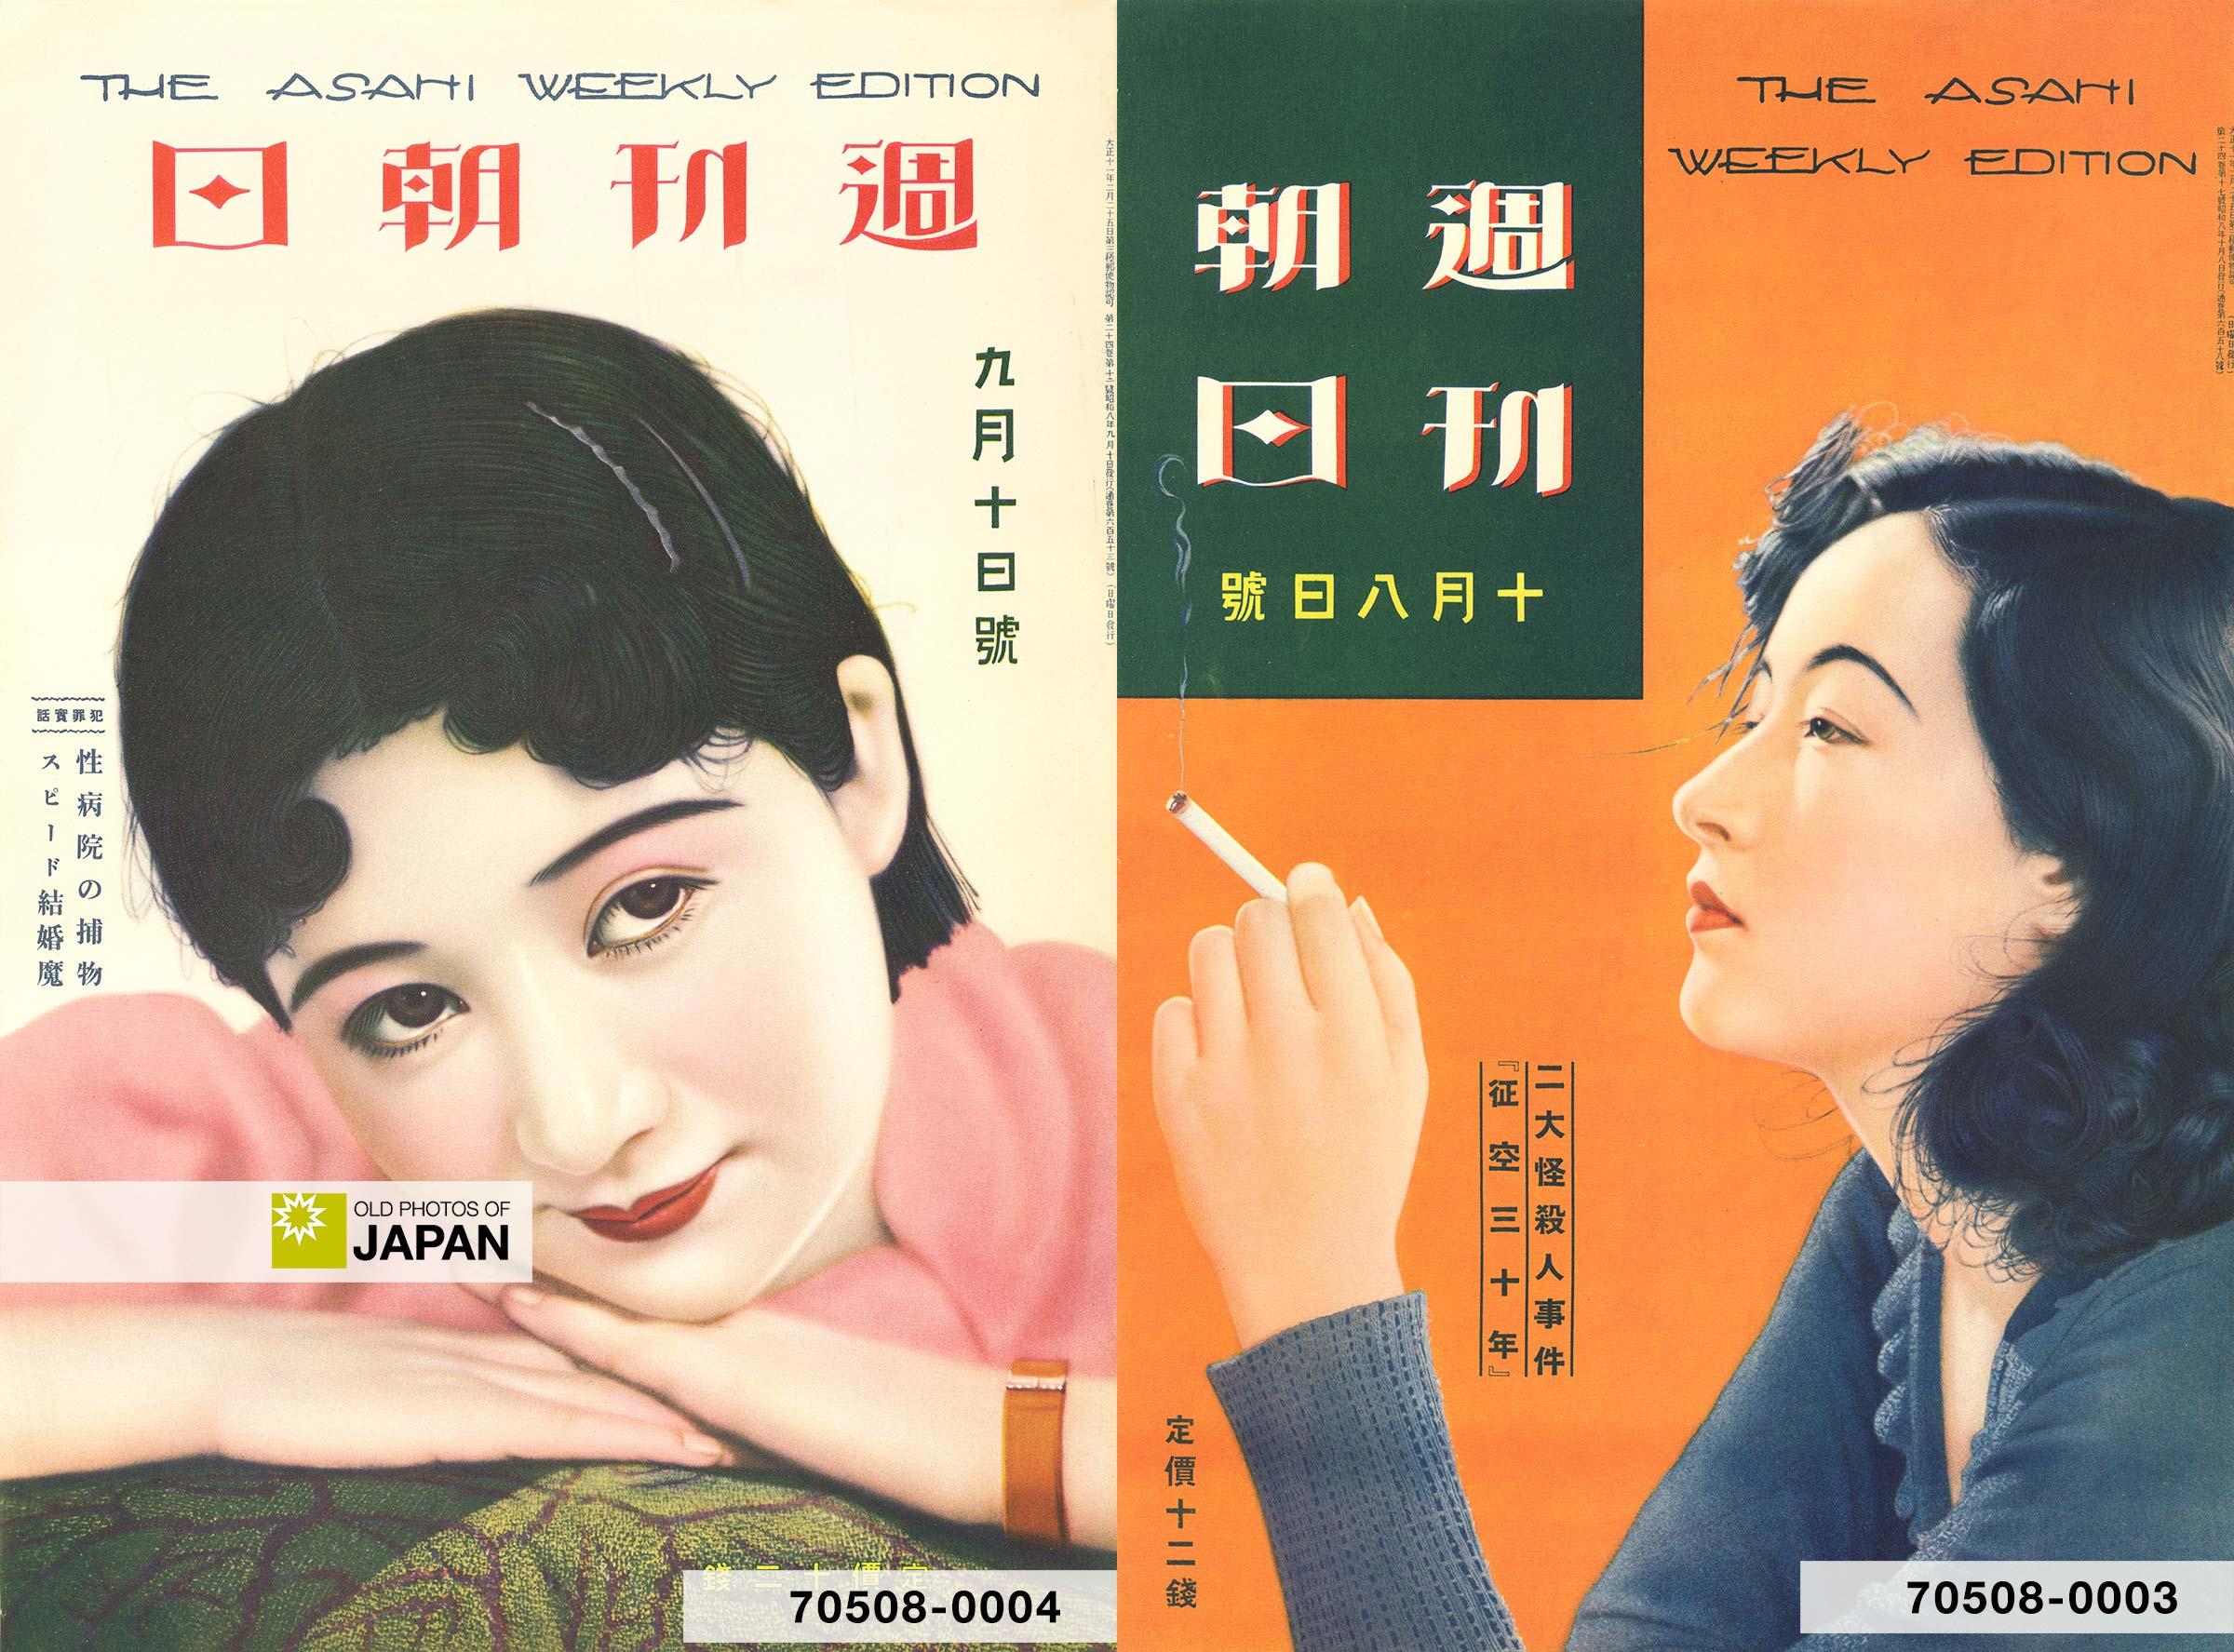 Asahi Weekly (Shukan Asahi)